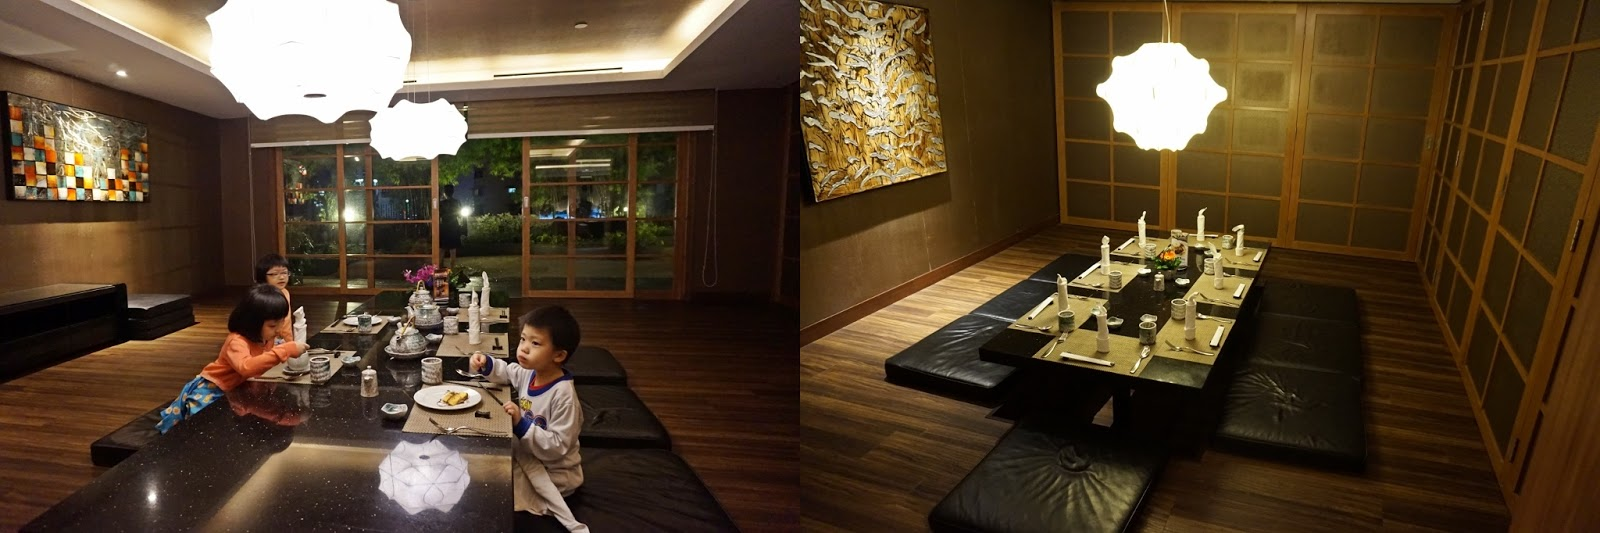 Gen Japanese Restaurant @ Sunway Putra Hotel Kuala Lumpur